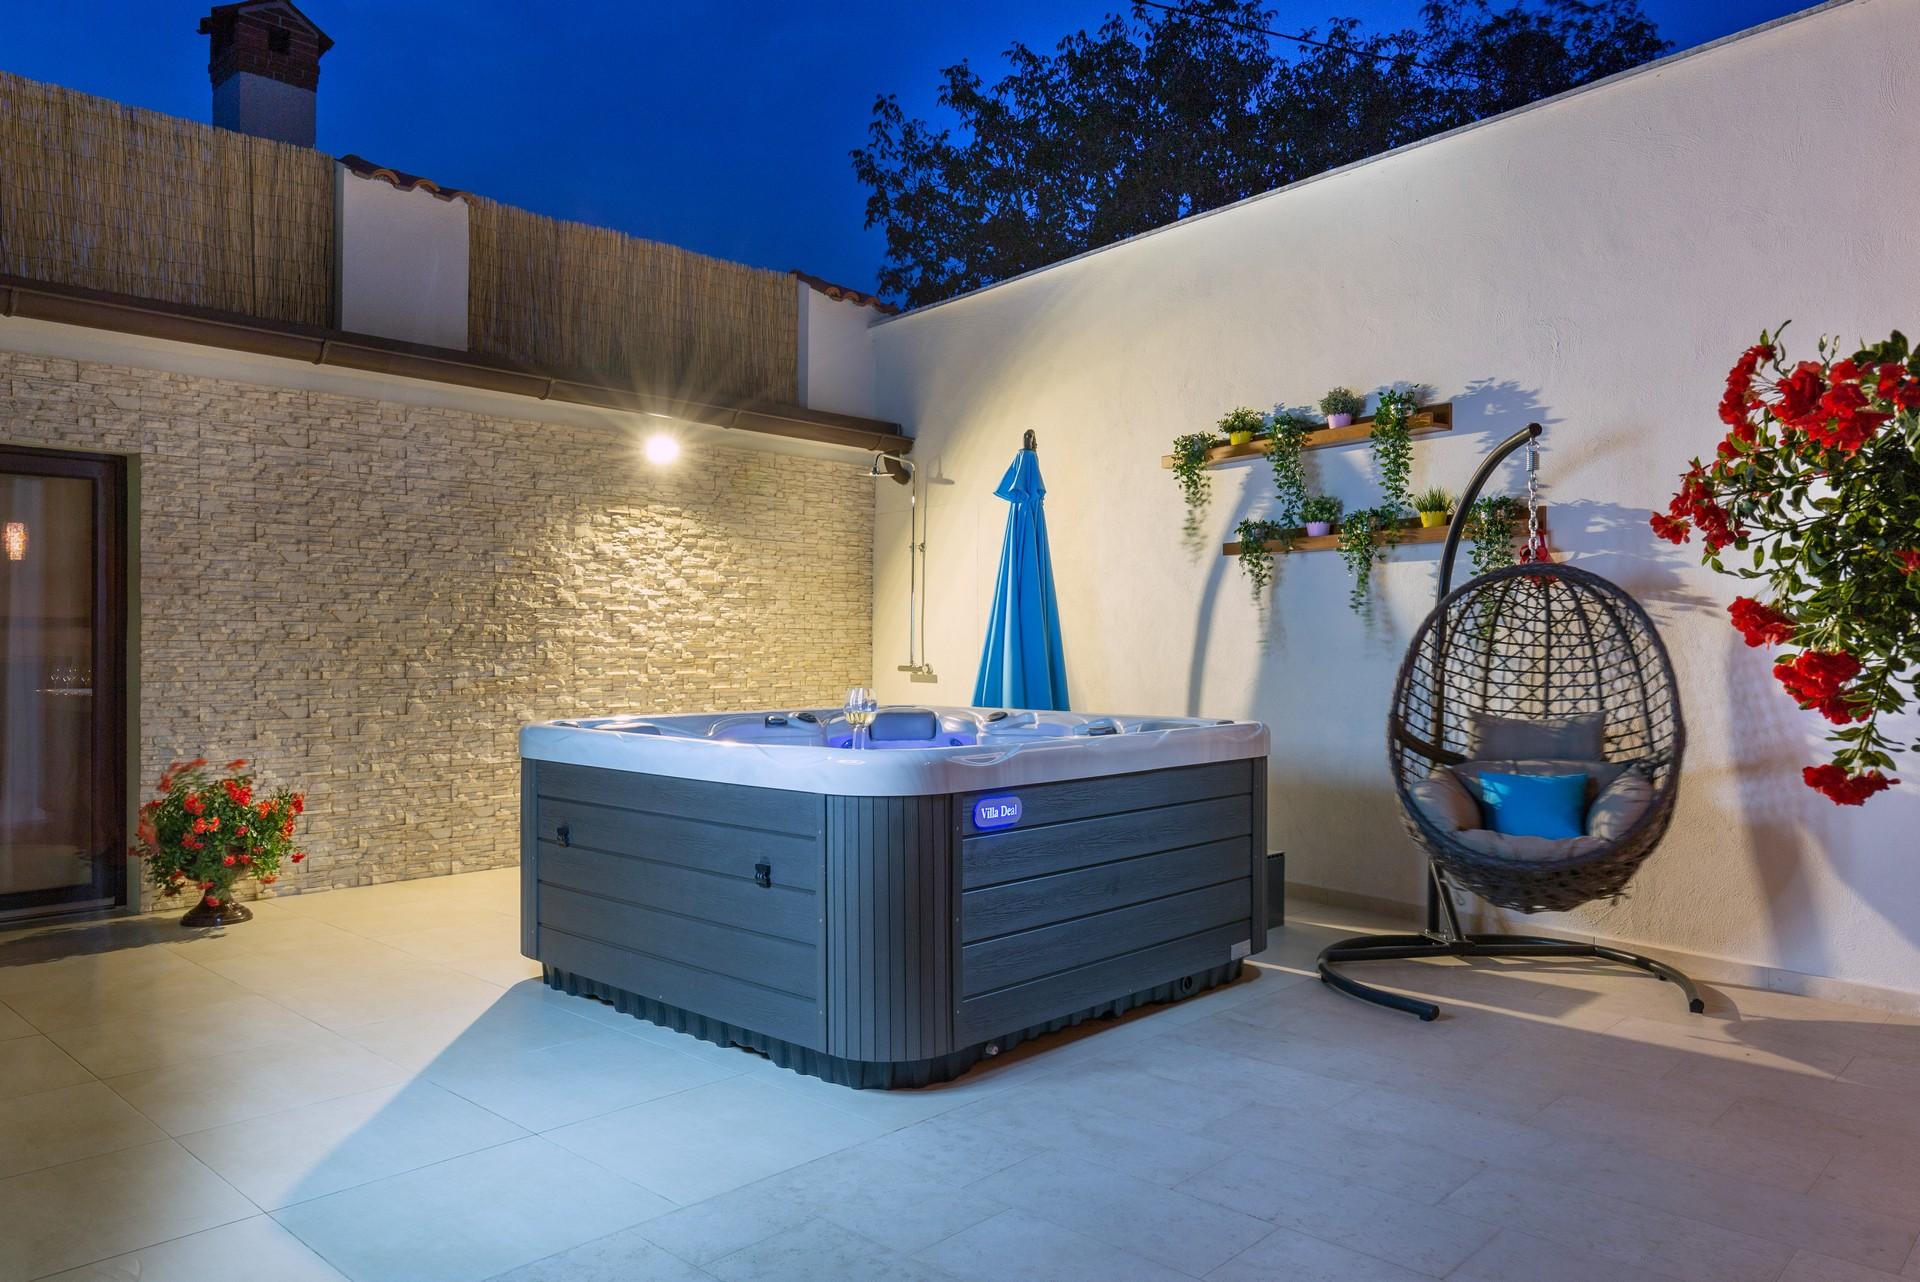 villa deal outdoors (19)